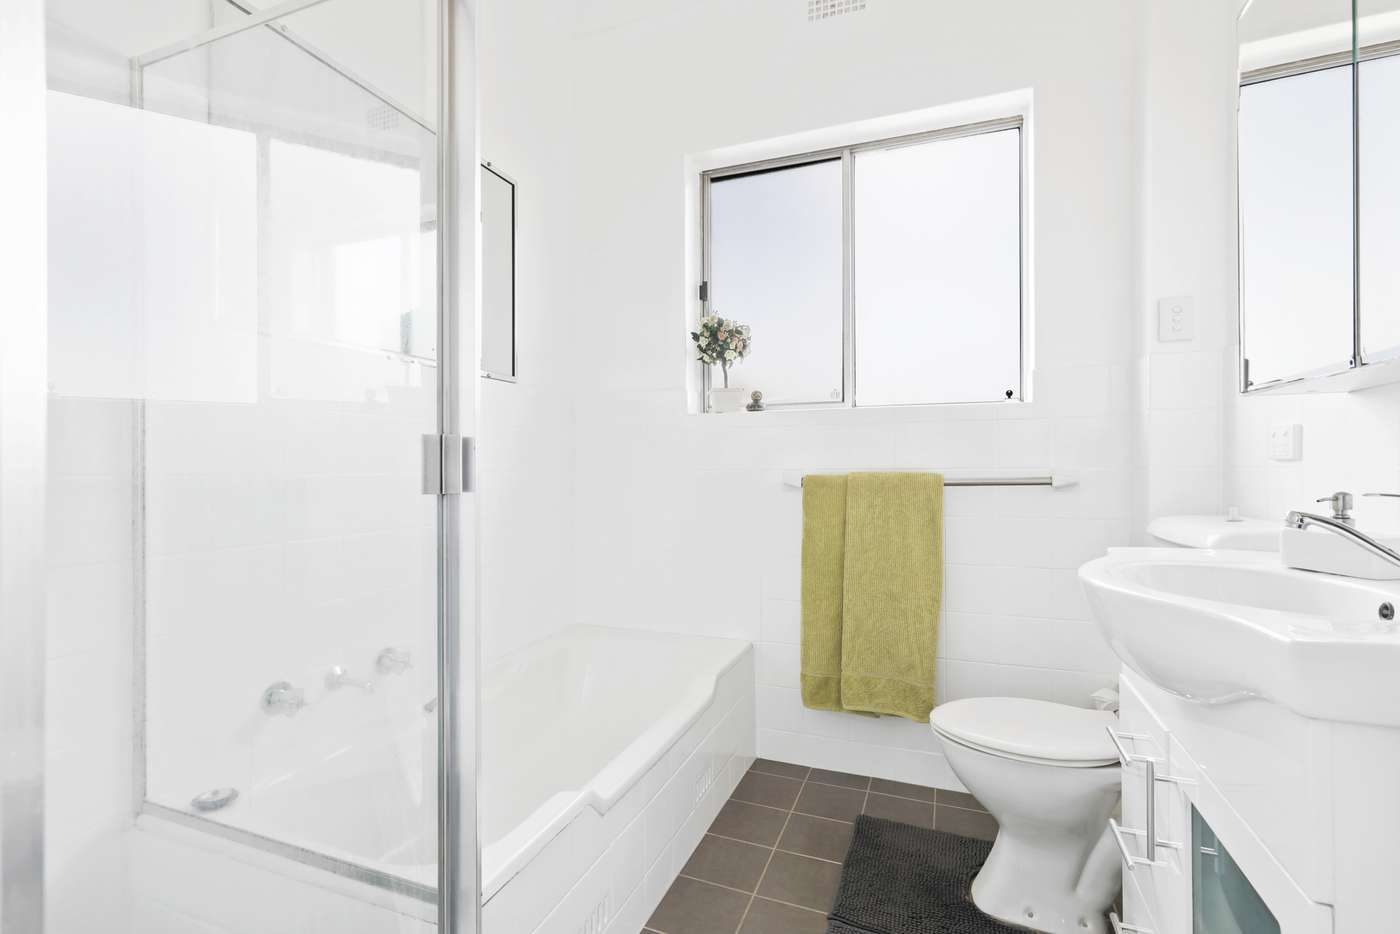 Sixth view of Homely apartment listing, 5/31 Boronia Street, Kensington NSW 2033